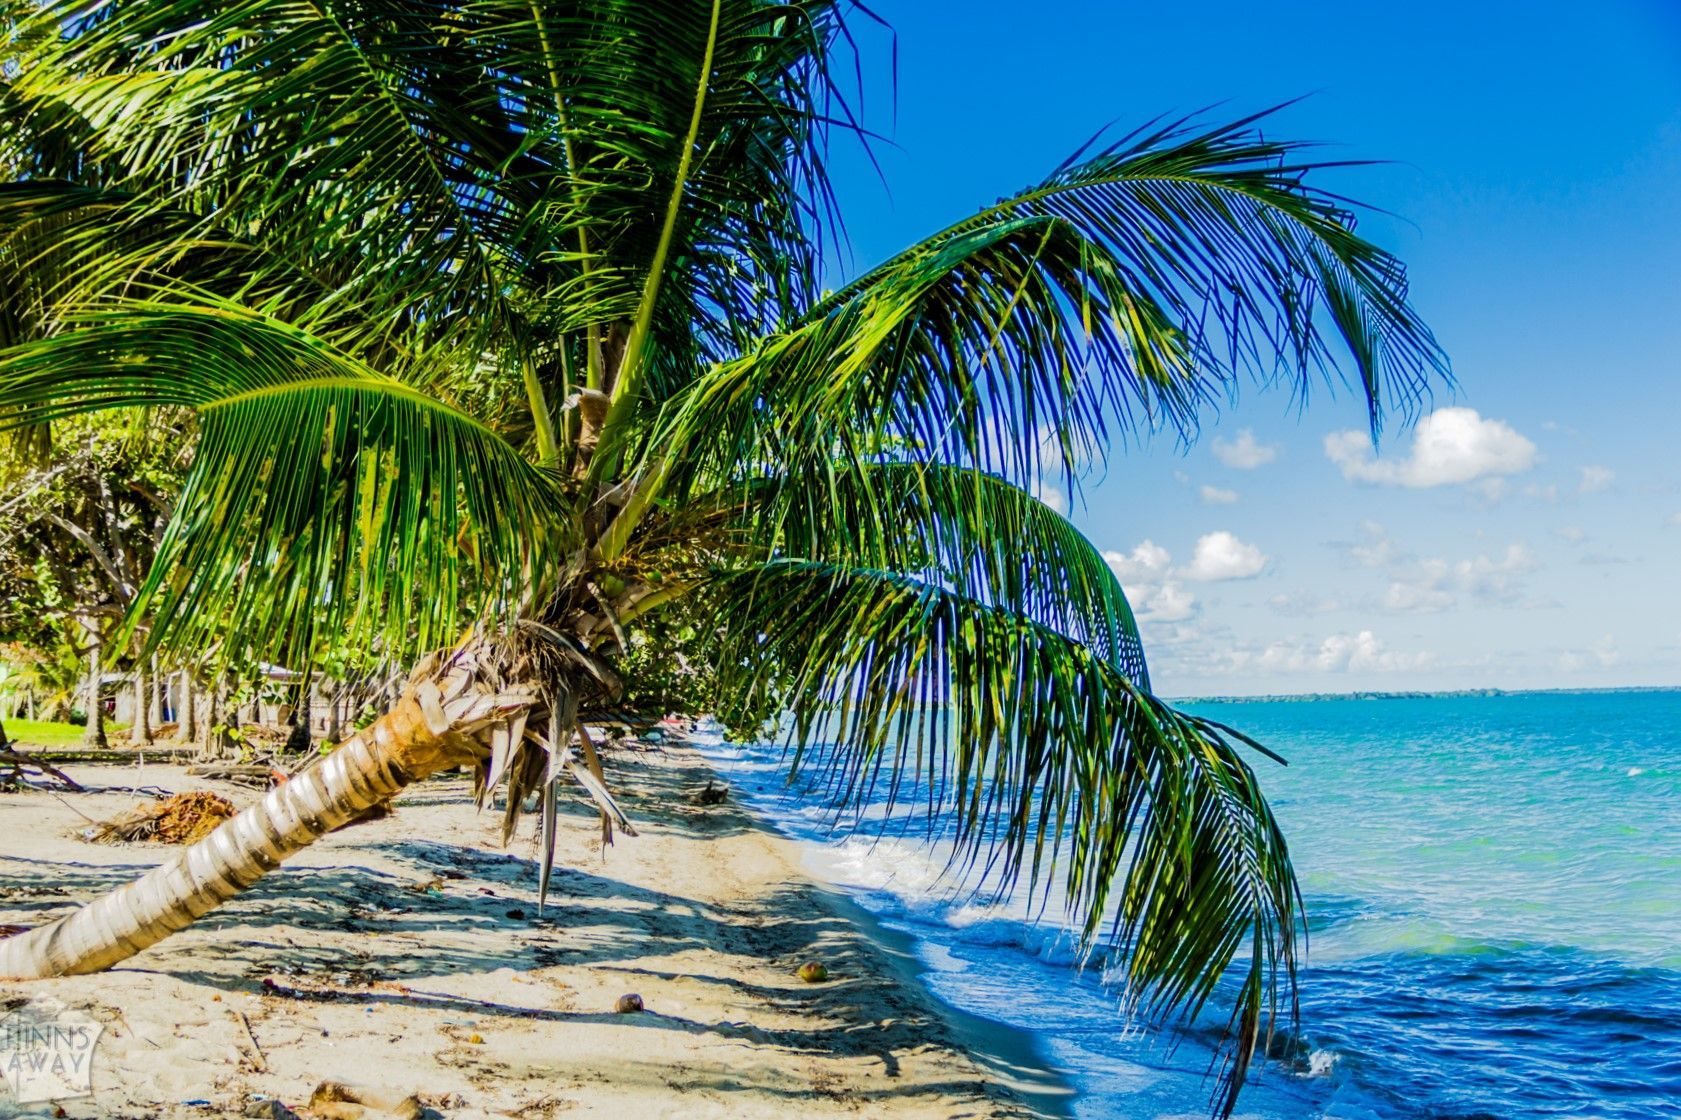 Hopkins, Belize | Itinerary for traveling in Belize, Honduras, Guatemala and El Salvador | FinnsAway Travel Blog